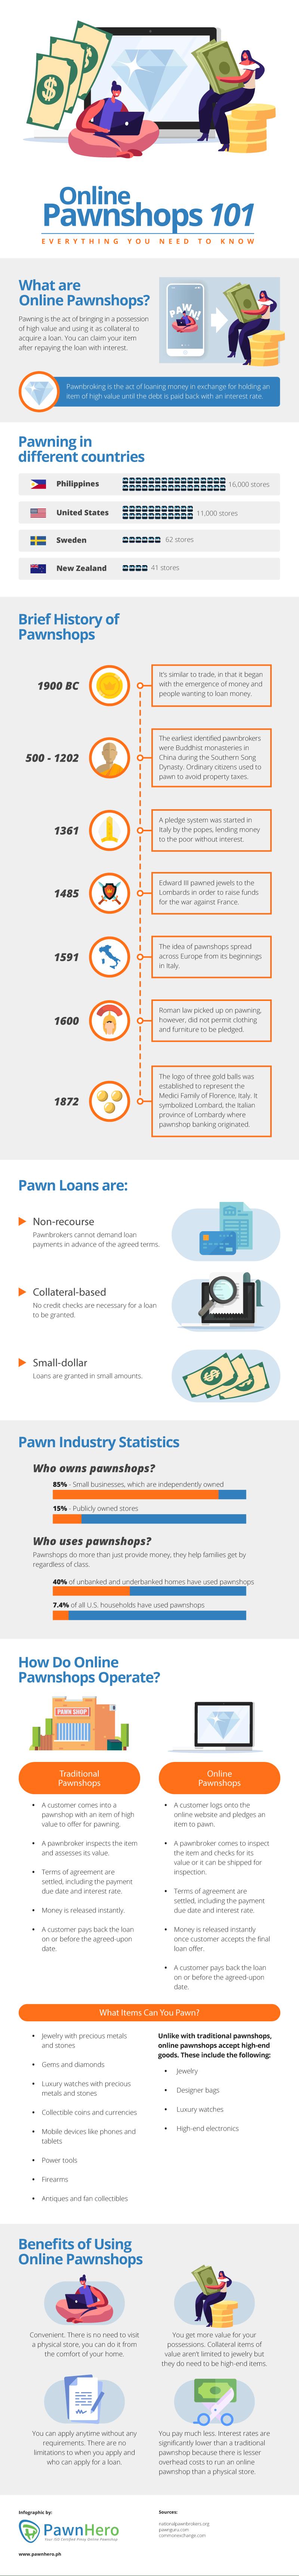 Online Pawnshops